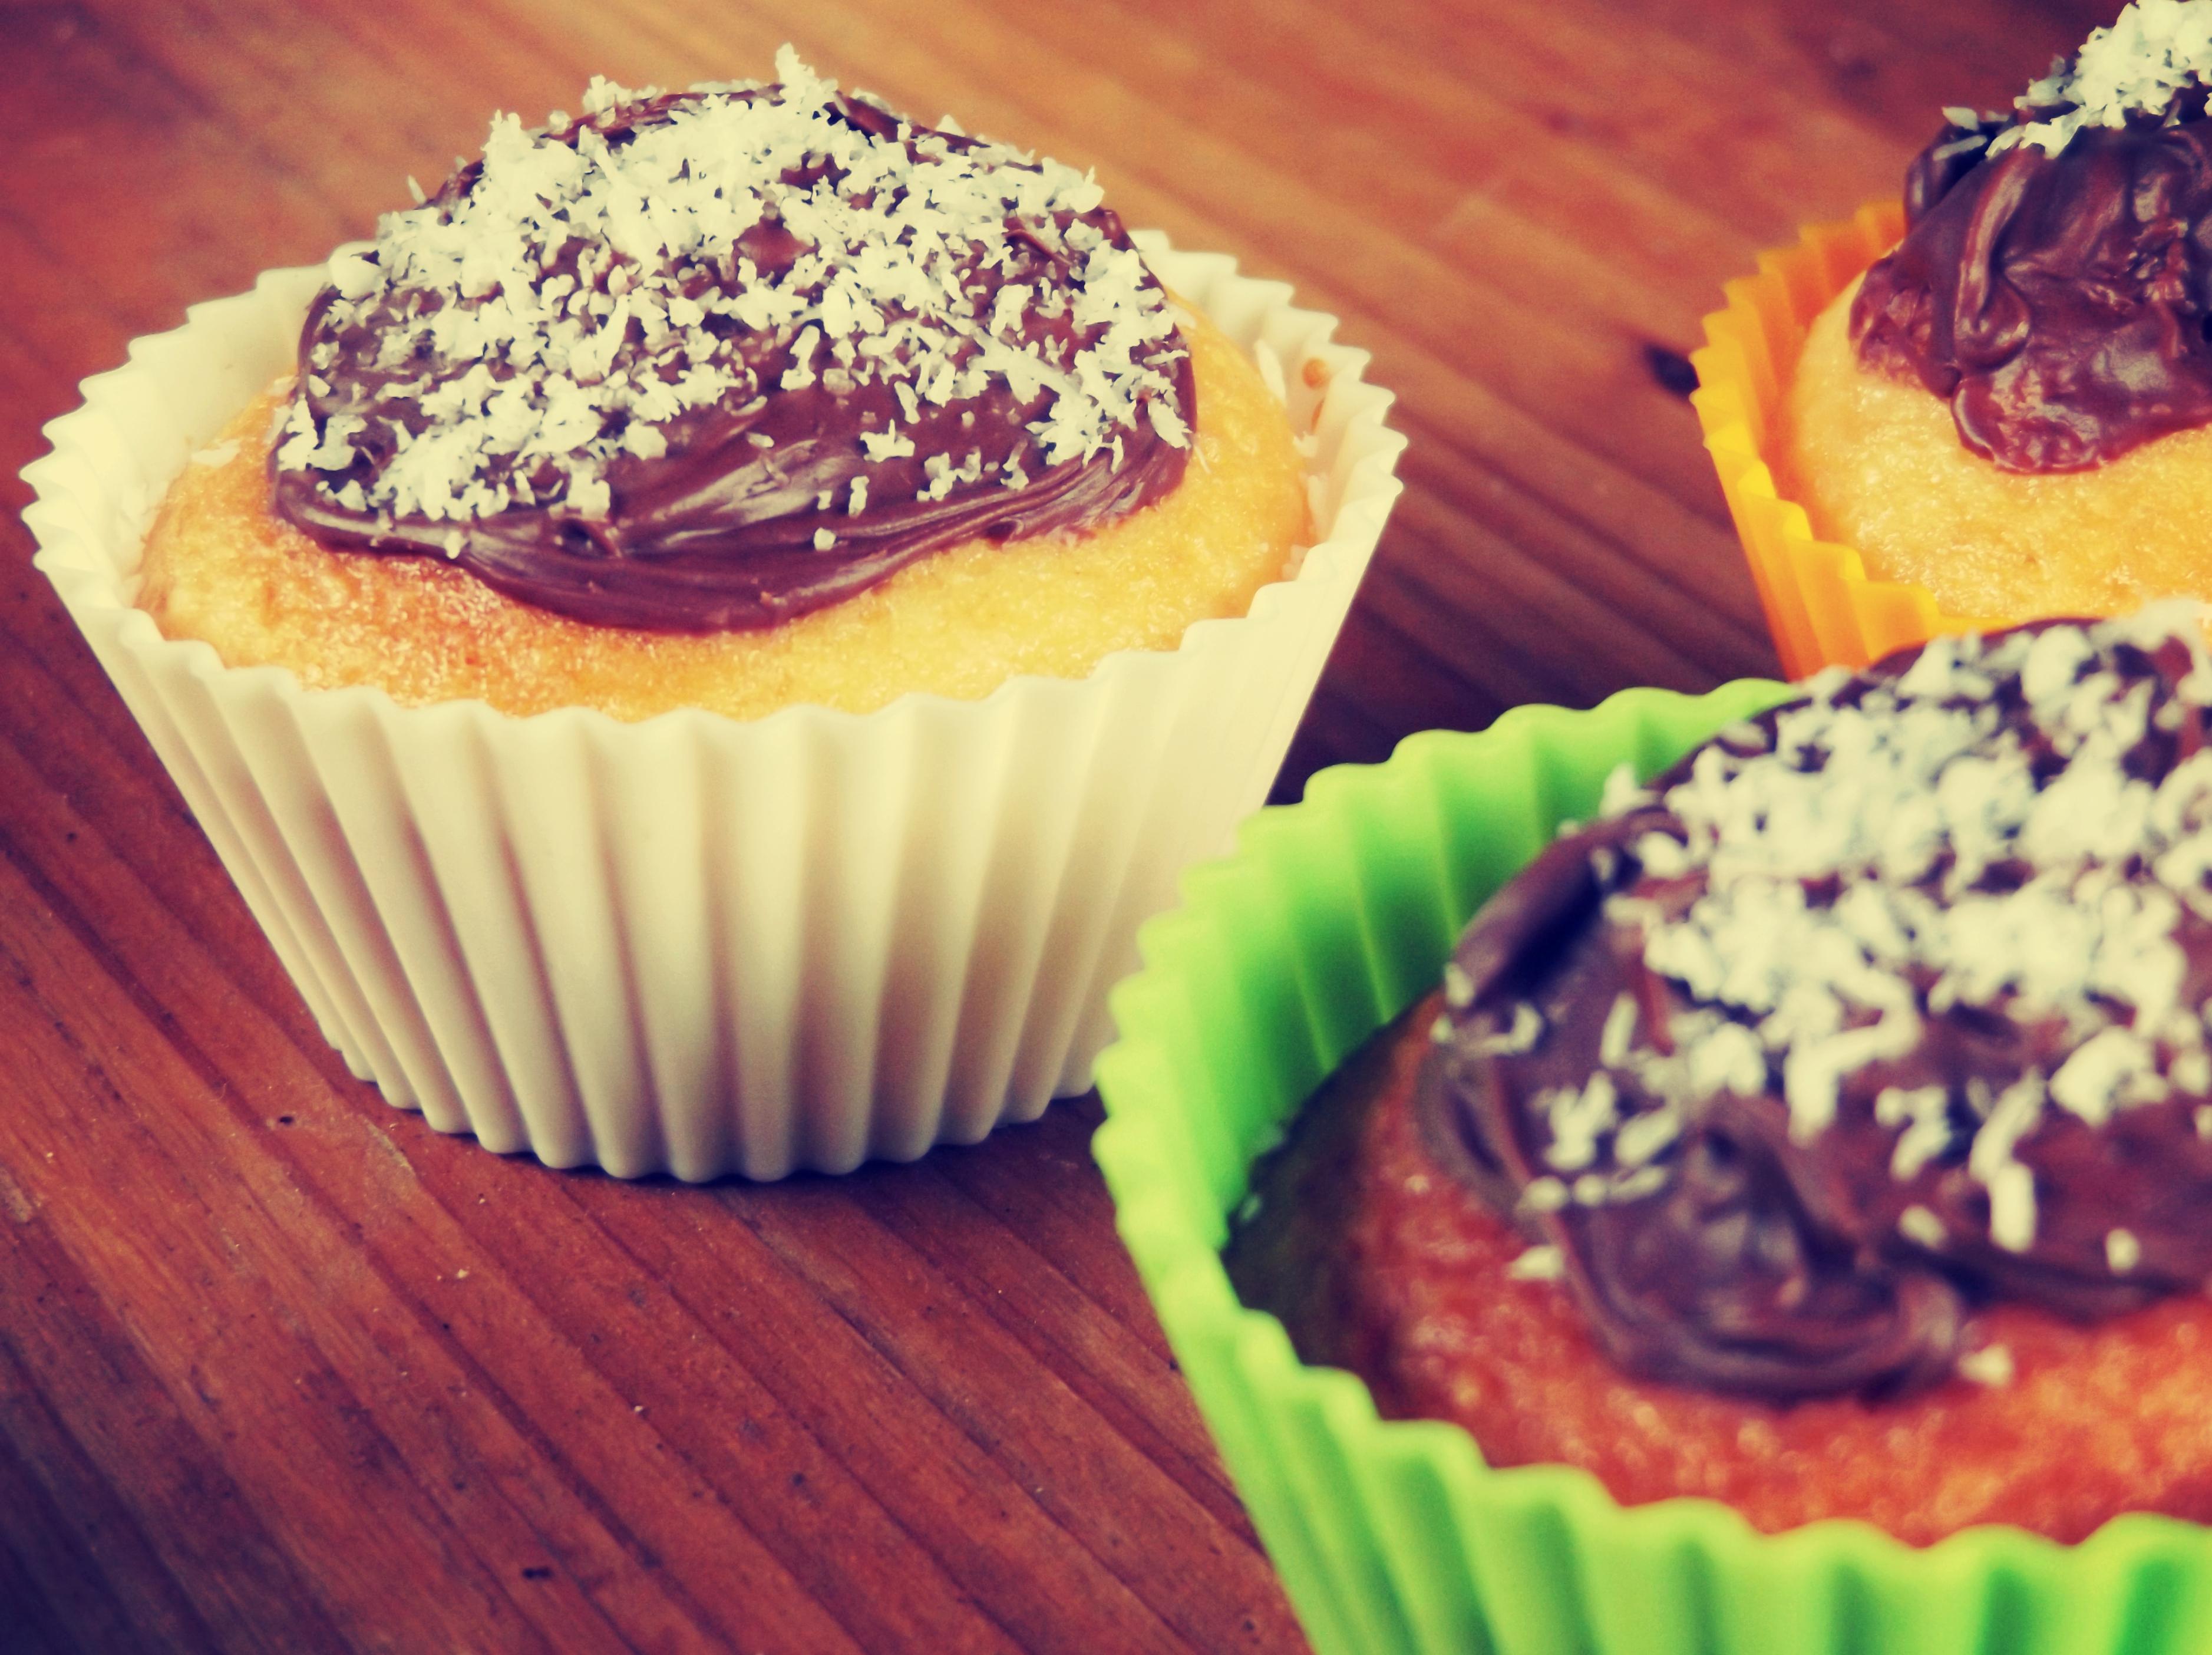 Coconut mini cakes with Nutella